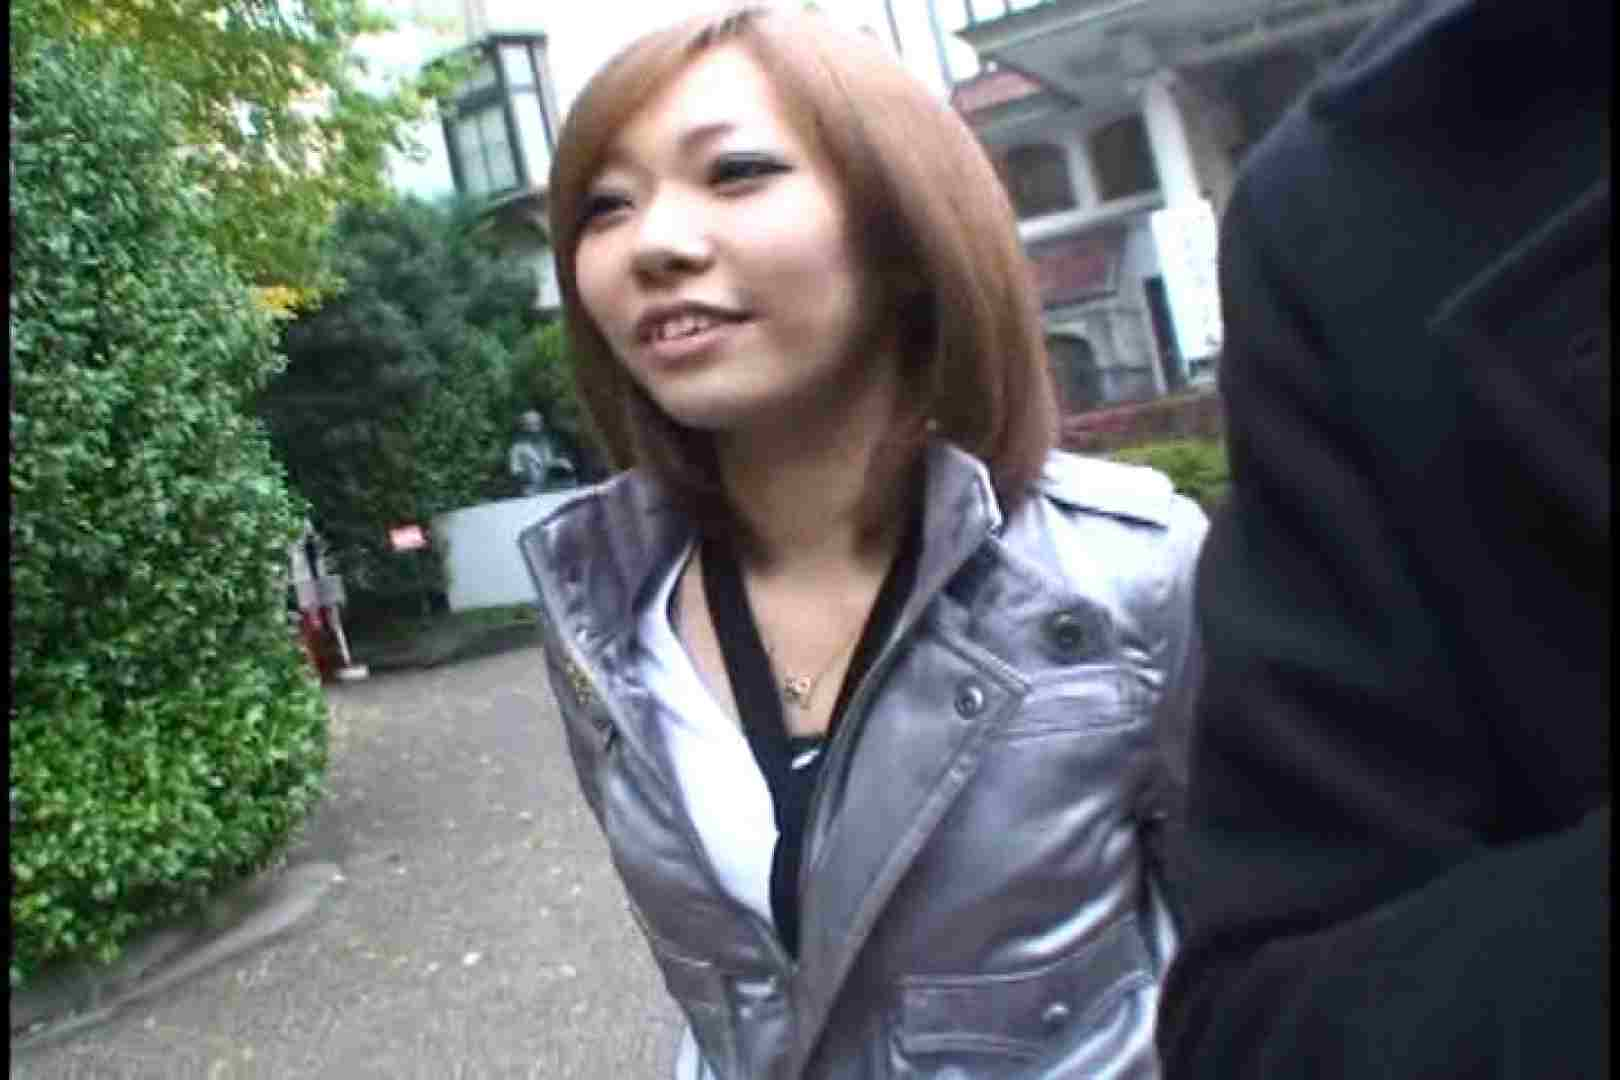 JDハンター全国ツアー vol.036 前編 女子大生のエロ動画  85PIX 4